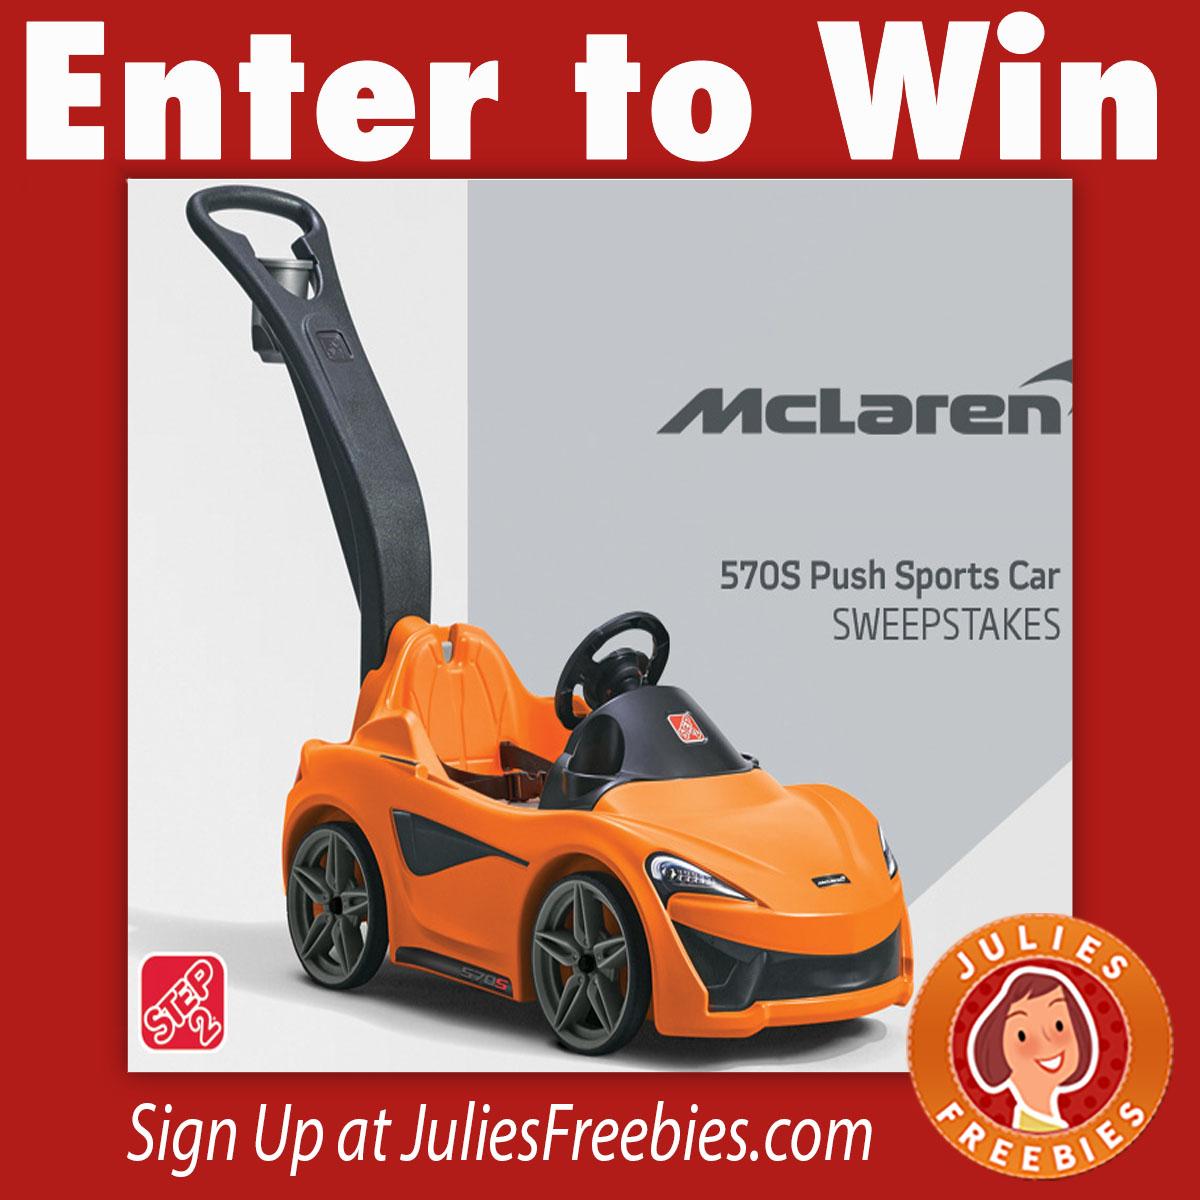 Win A Step2 McLaren 570S Push Sports Car